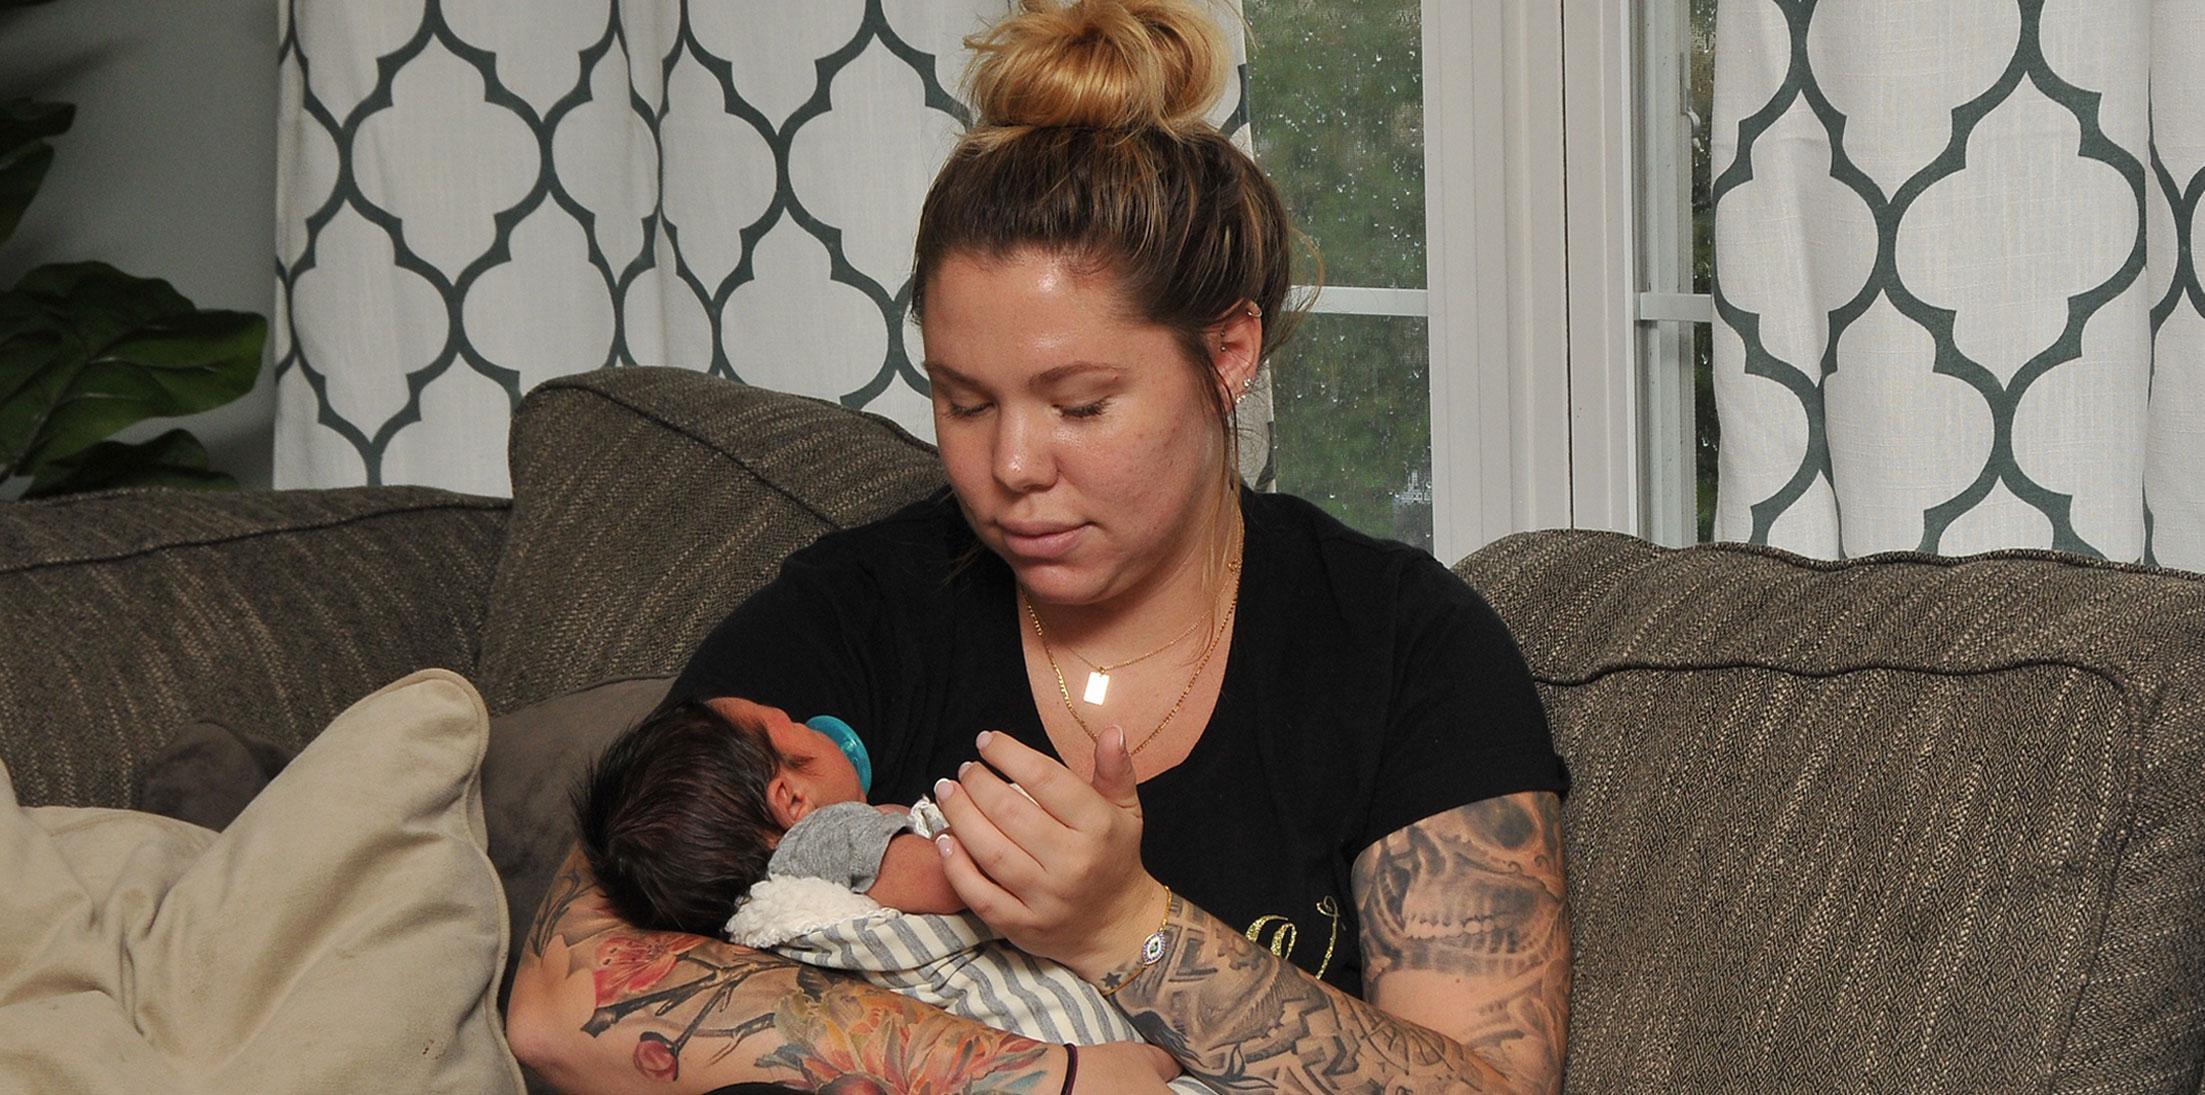 Kailyn Lowry Baby Chris Lopez Custody Video Long